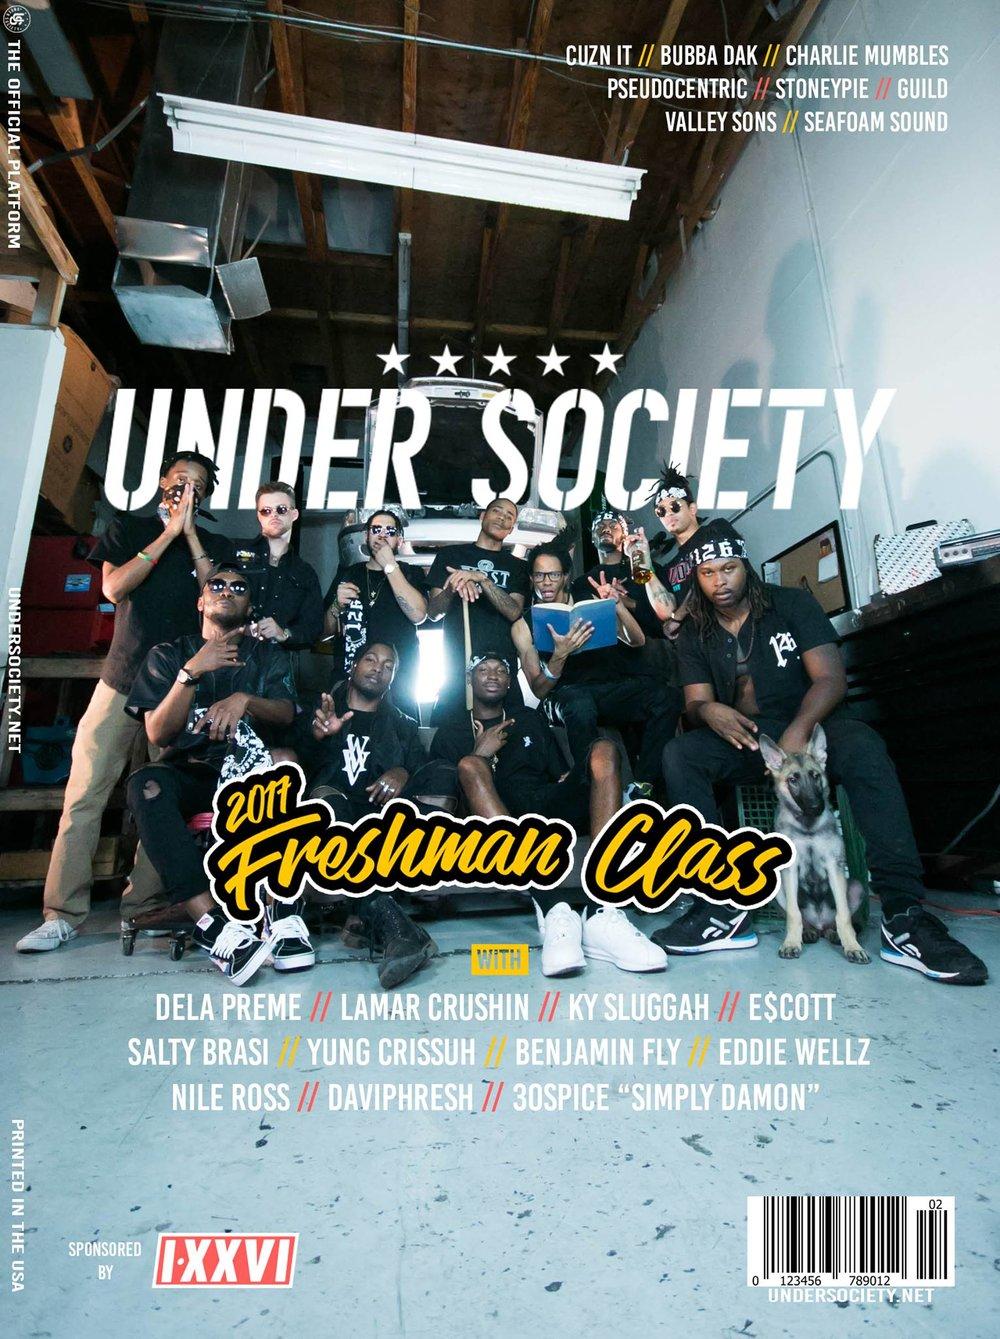 Under Society  announces the 2017 Freshman Class!